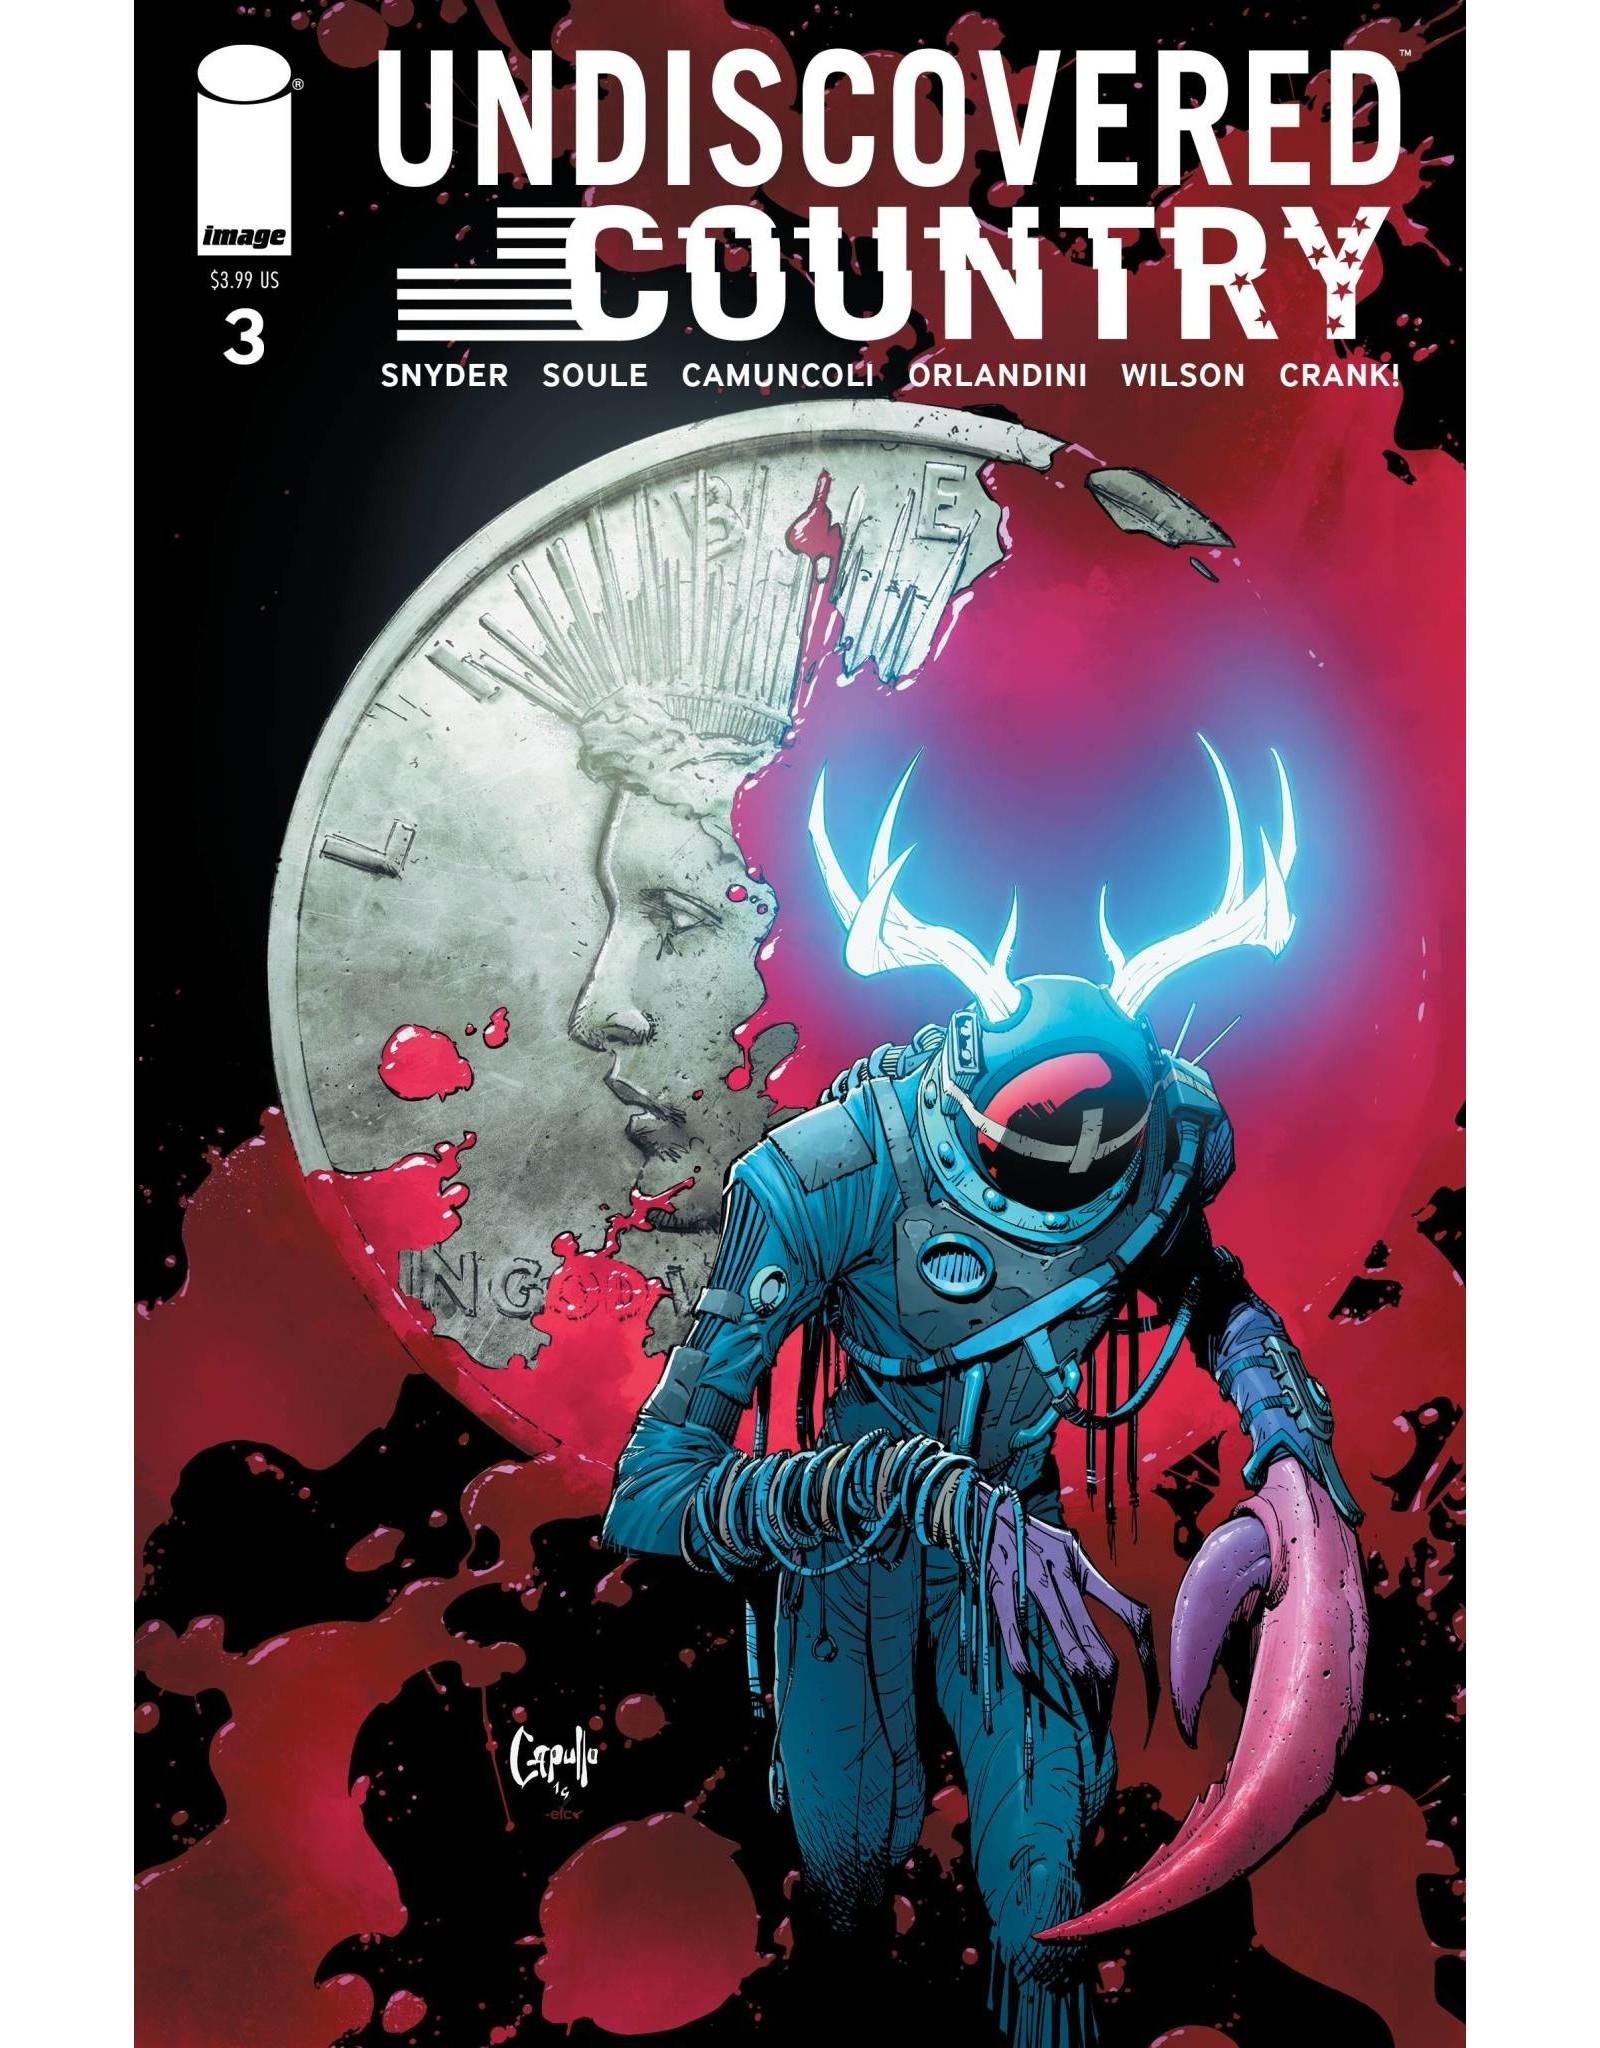 Image Comics UNDISCOVERED COUNTRY #3 CVR B CAPULLO (MR)